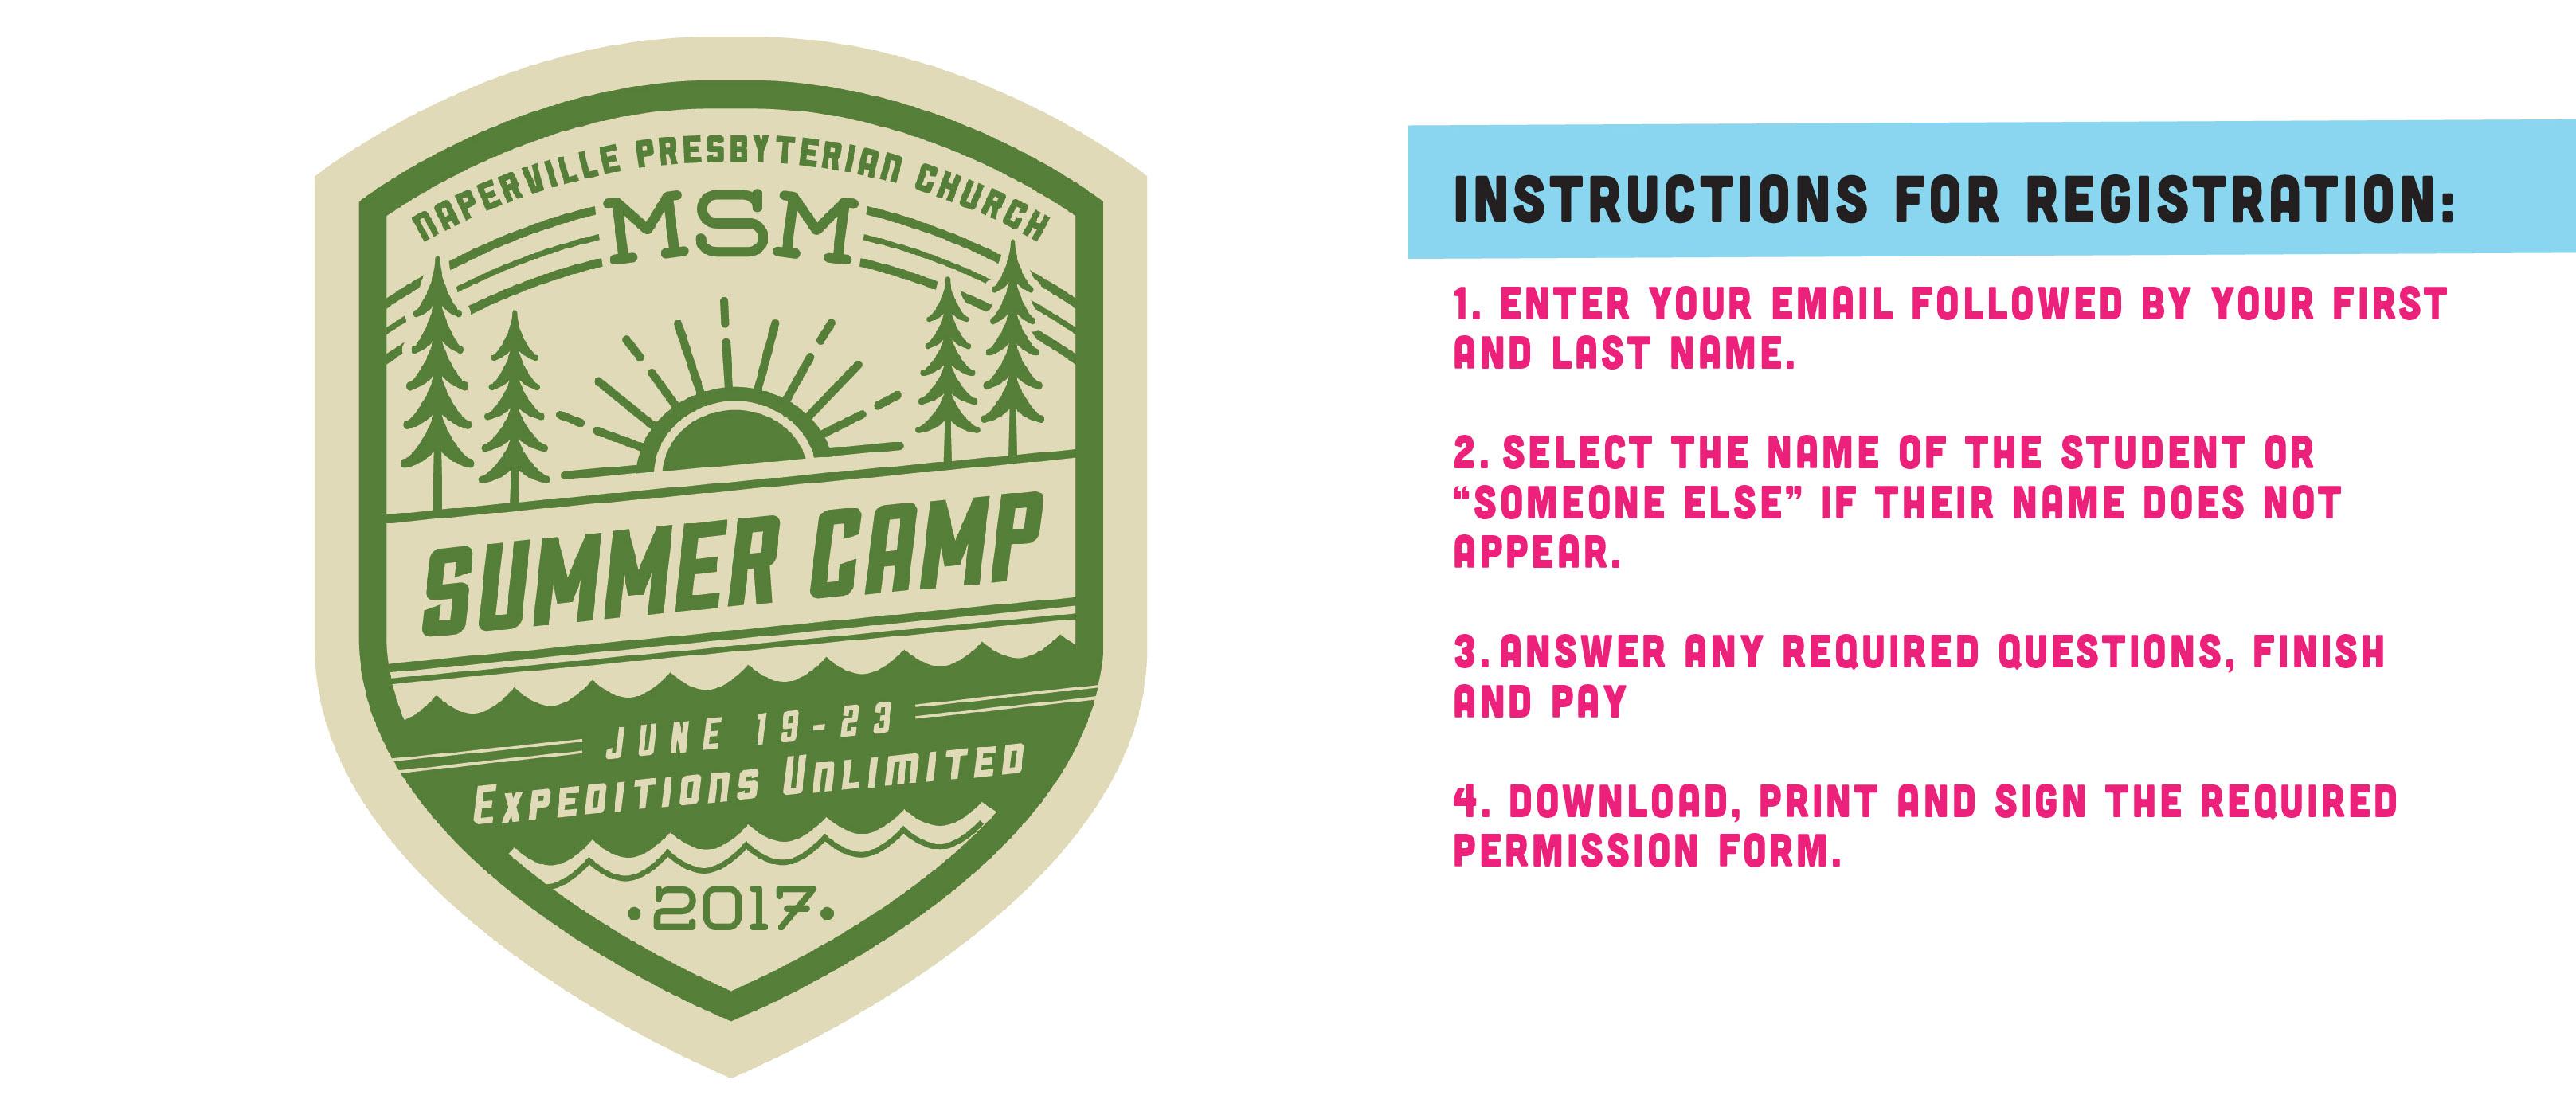 Msm camp pc instructions